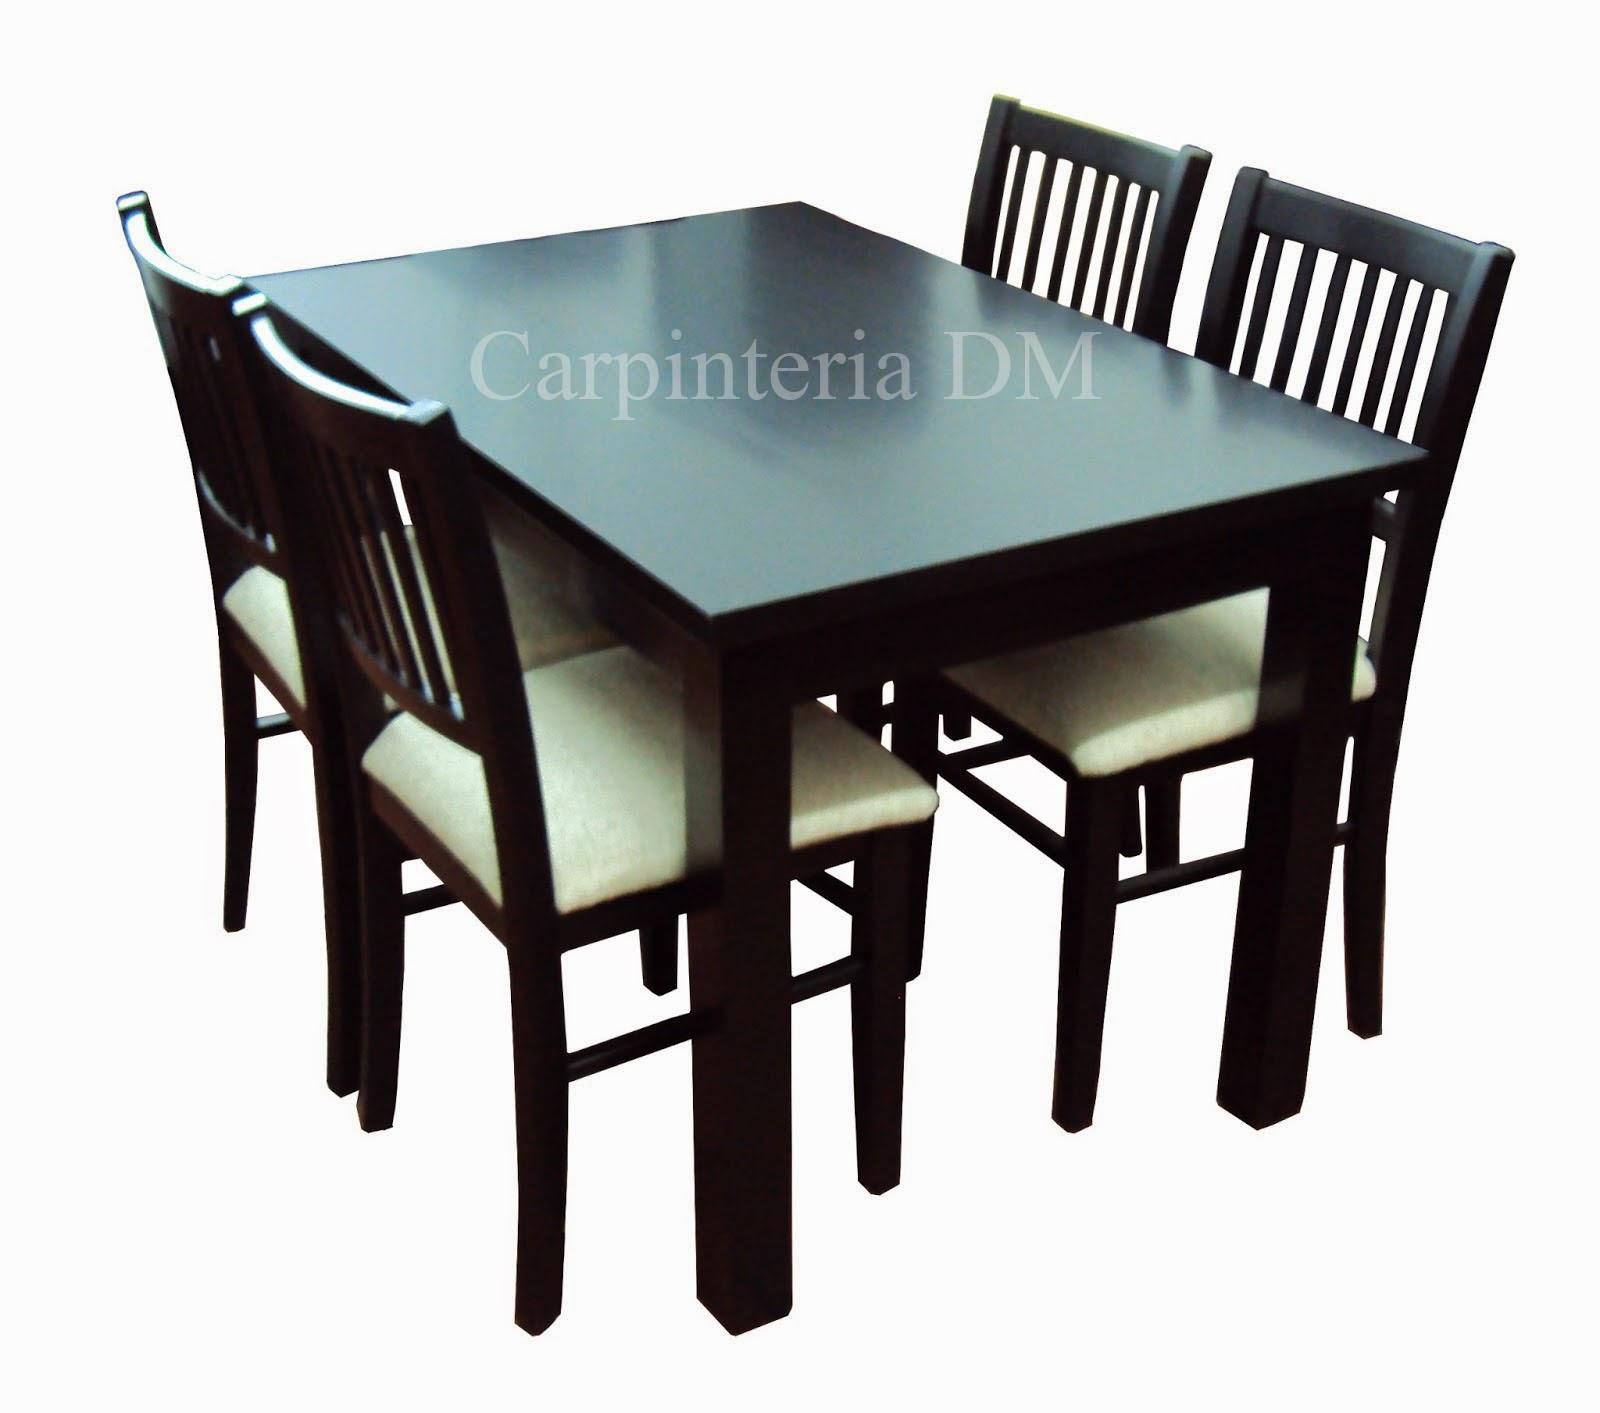 Mesas comedor capinteriadm dise os for Comedores de 4 sillas economicos